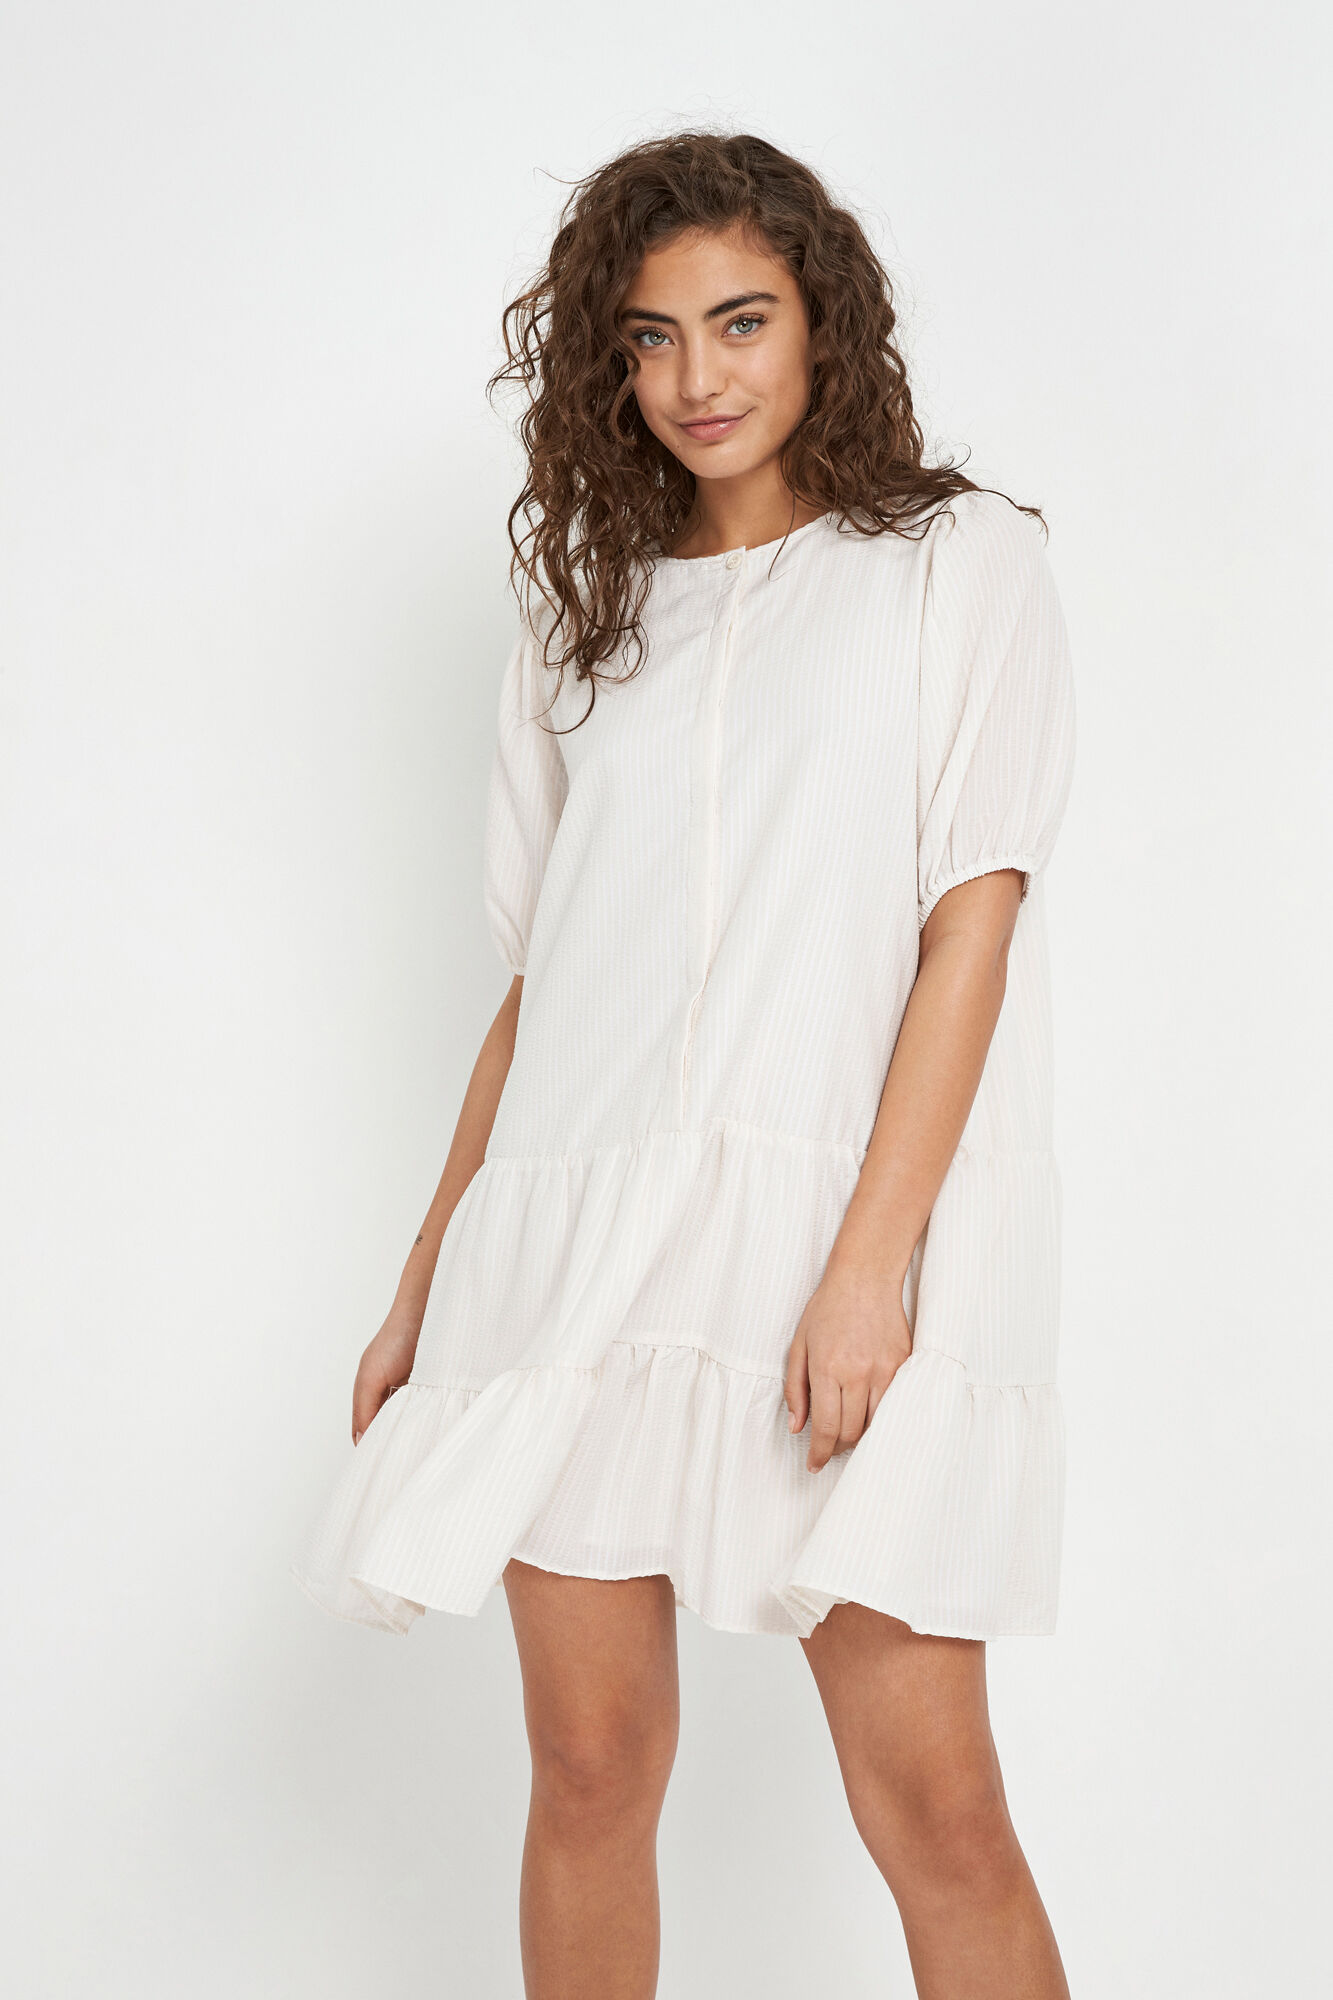 ENMAGIC SS SHORT DRESS 6740